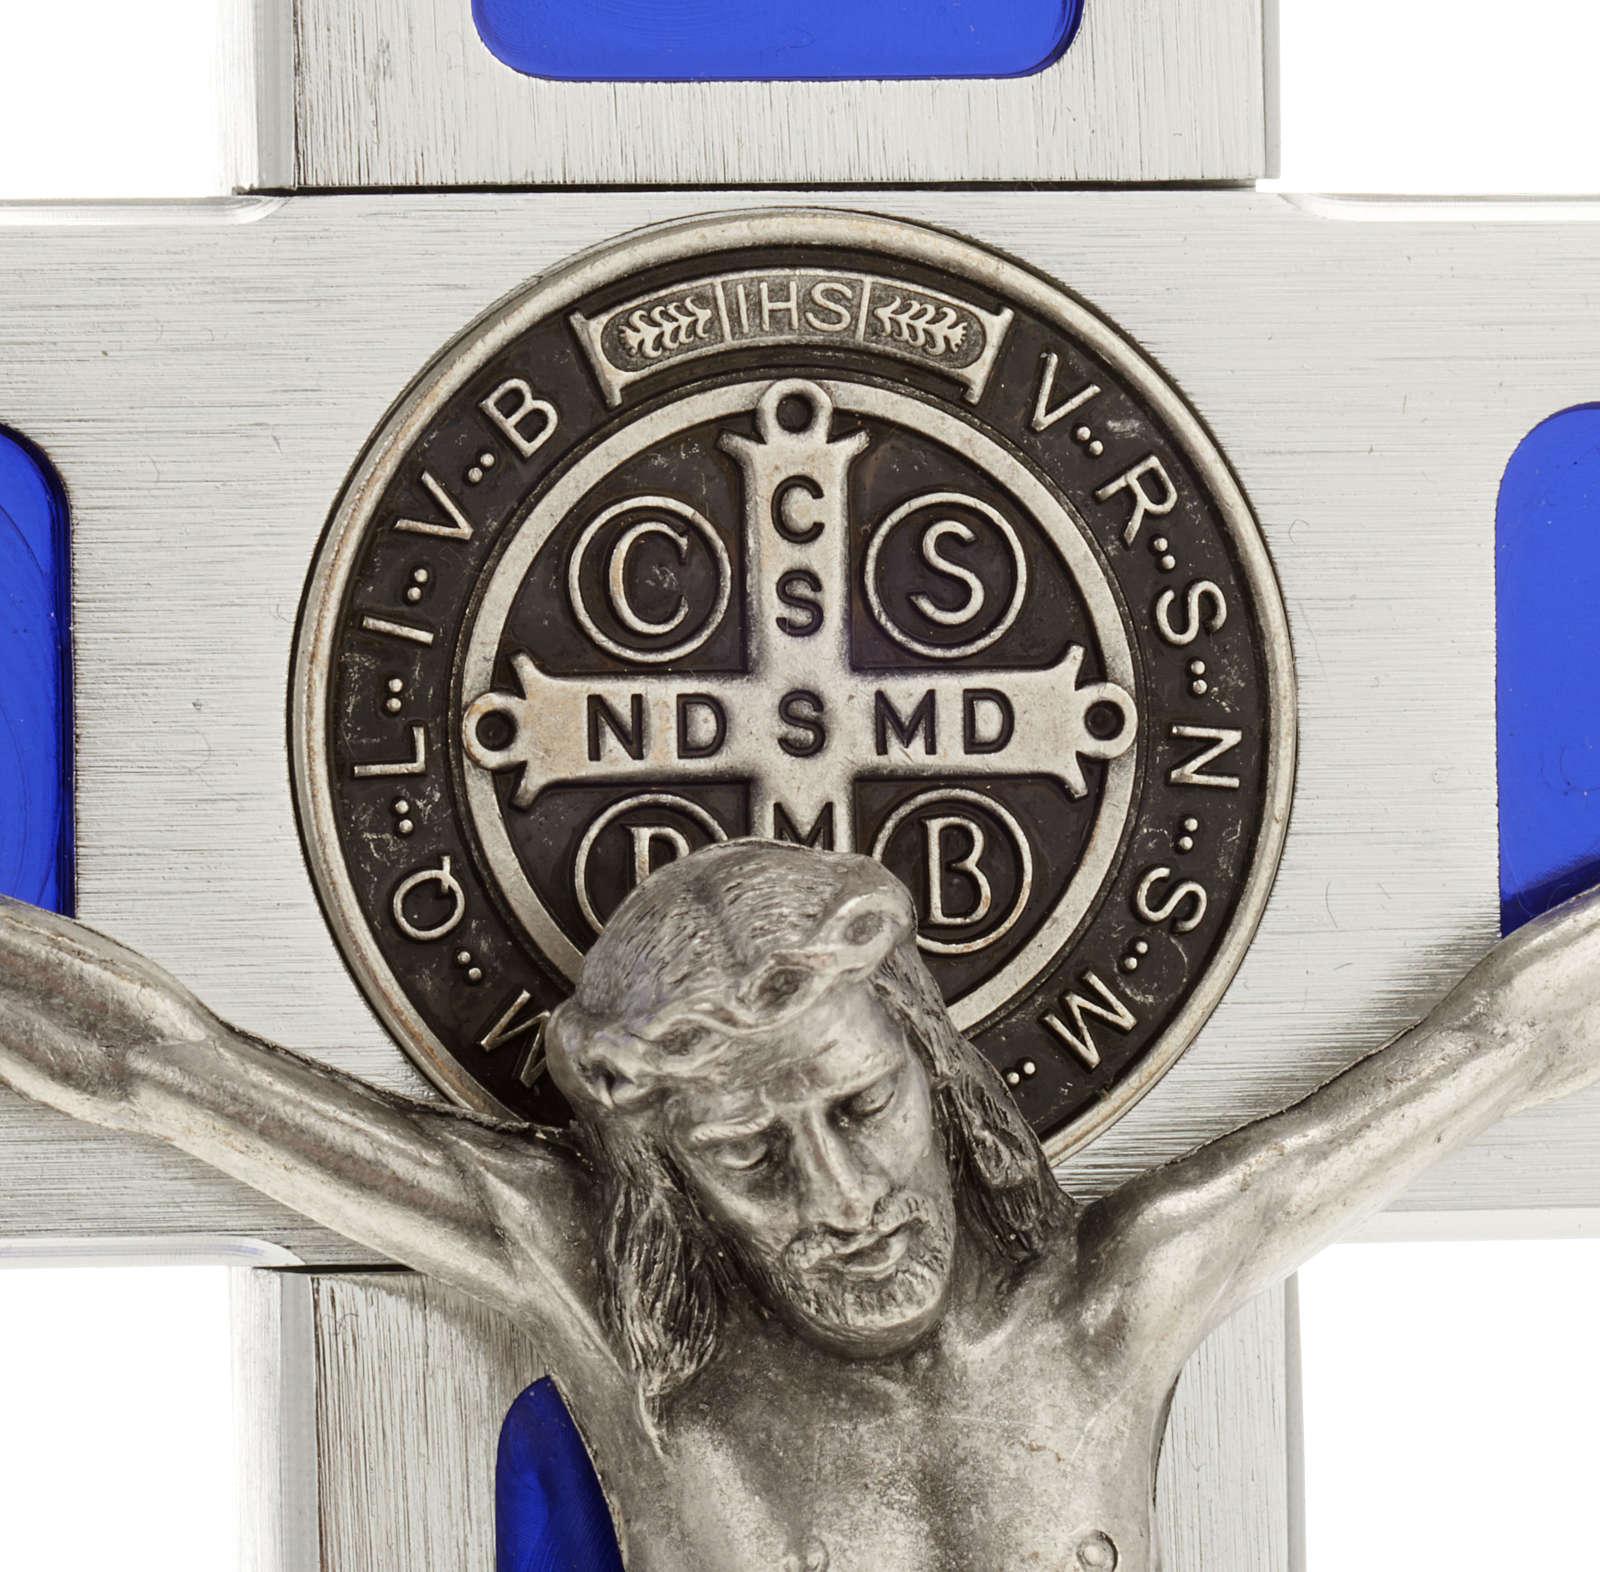 Cruz de mesa de latón con esmalto azul de Jesús 4